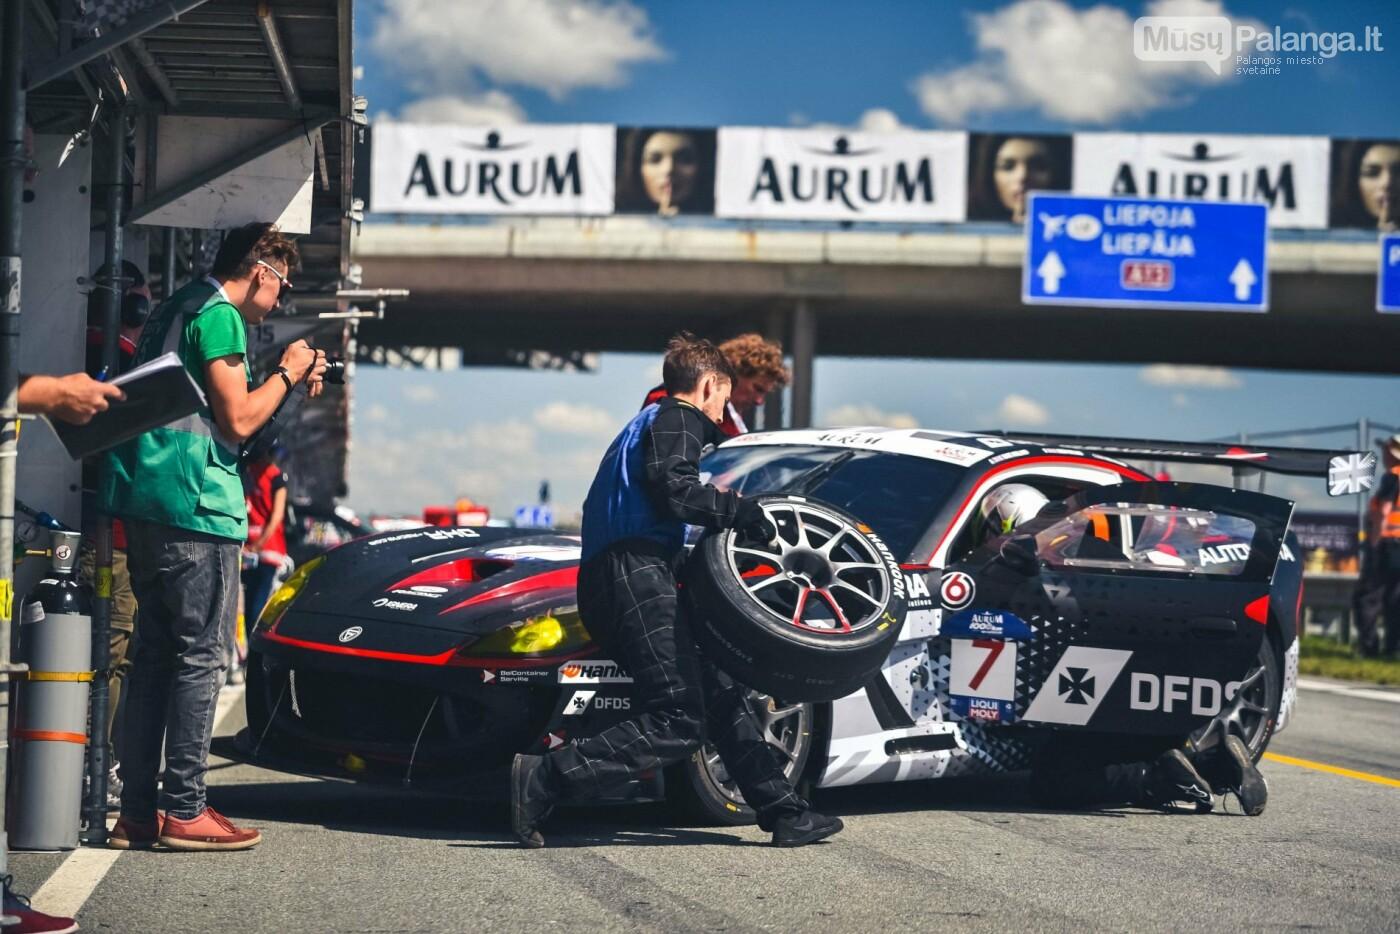 "22-osios ""Aurum 1006 km lenktynės"" – 2021 m liepos 14-17 d.d. , nuotrauka-11, Vytauto PILKAUSKO, Arno STRUMILOS ir Gedmanto KROPIO nuotr."